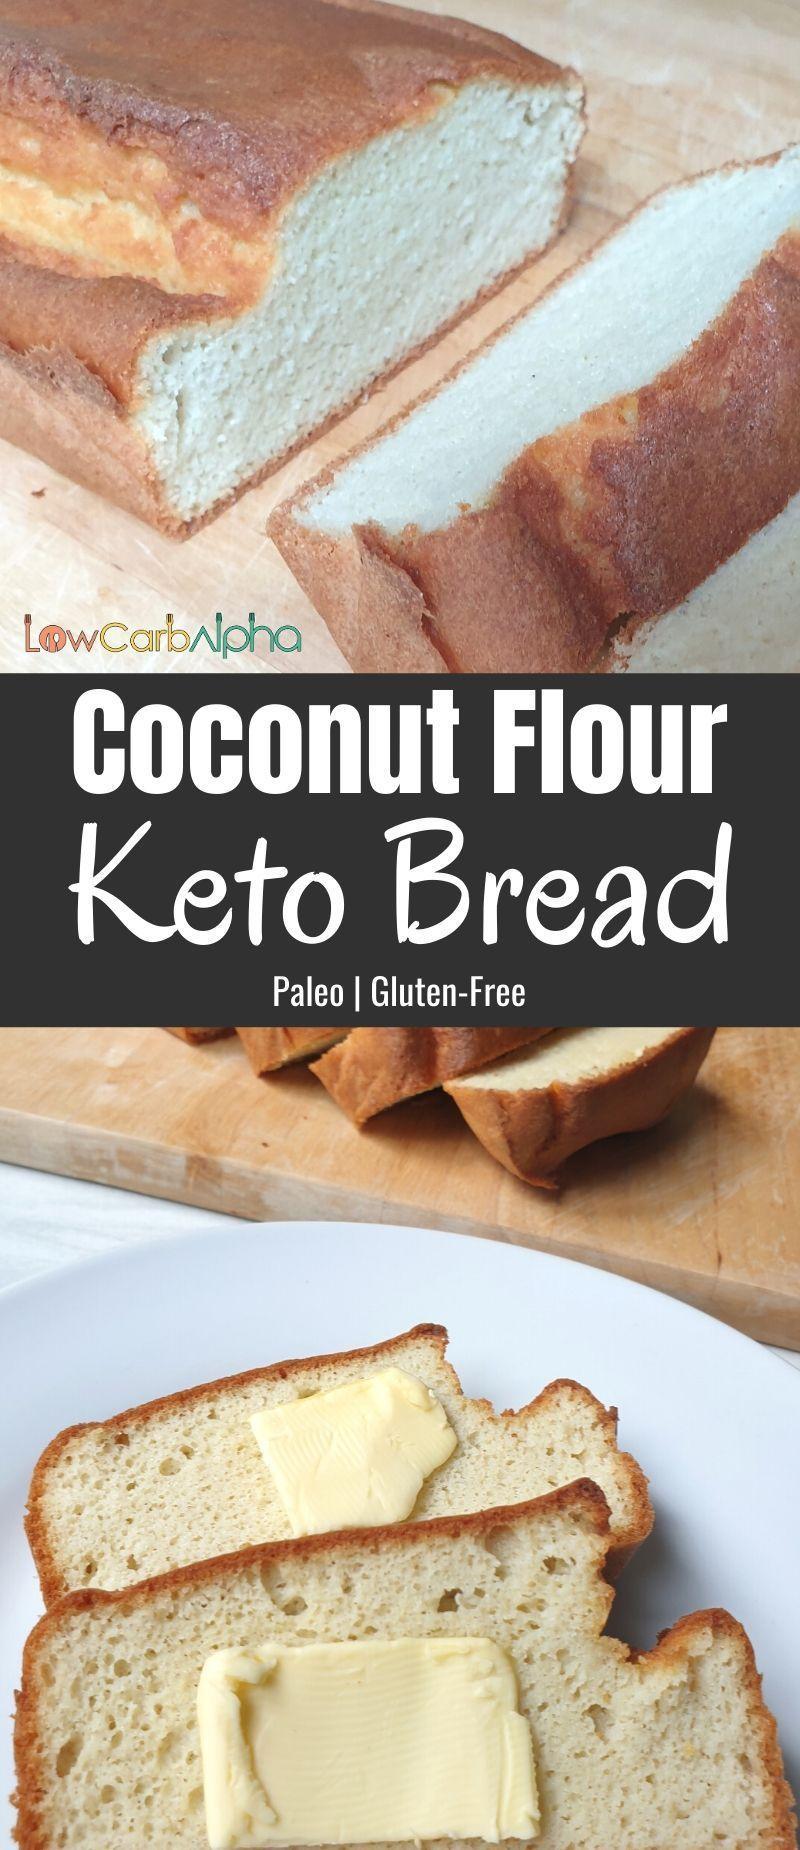 Keto Coconut Flour Bread Low Carb Alpha Recipe in 2020